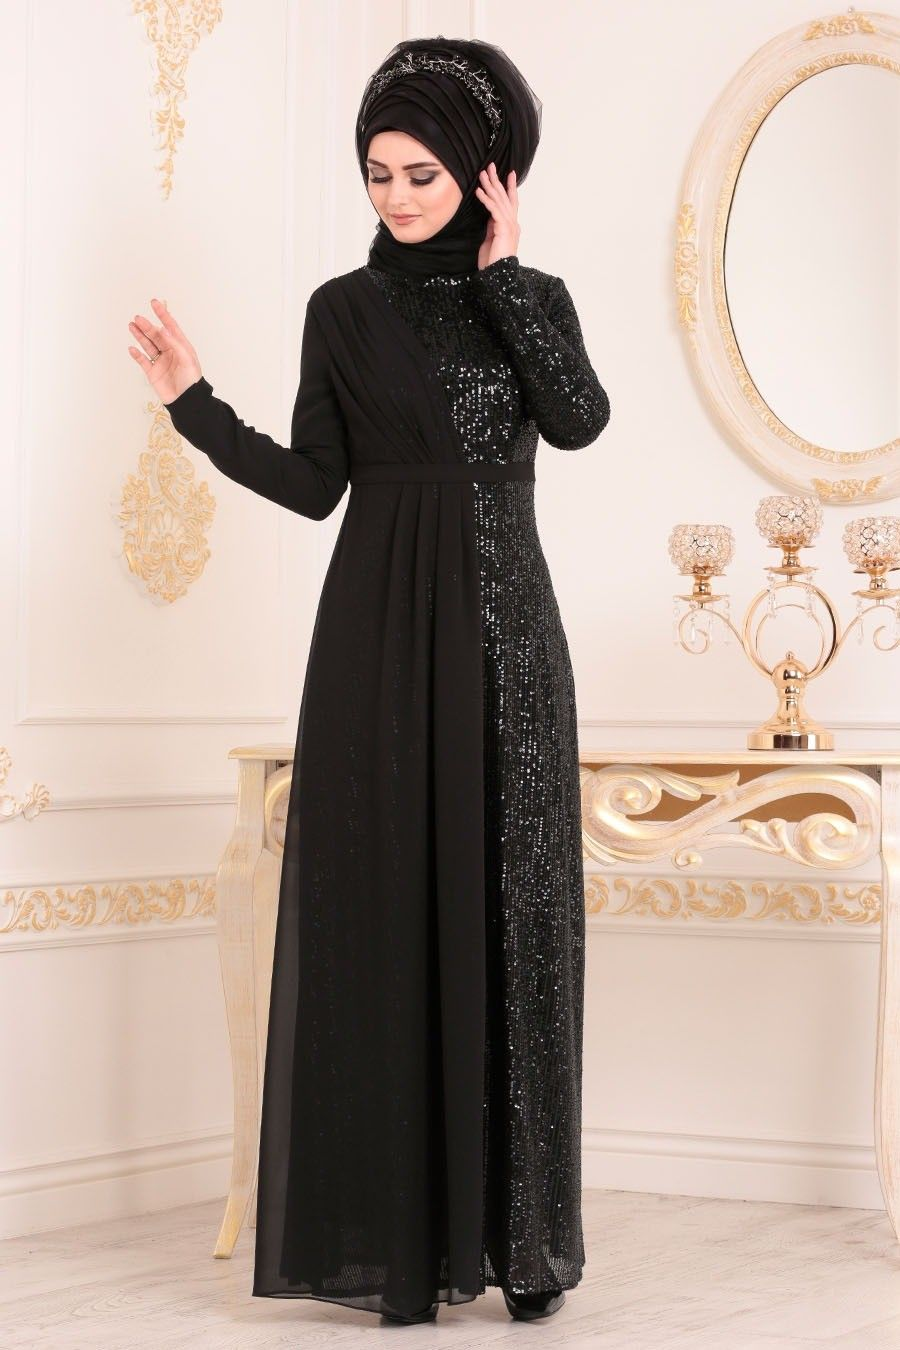 Tesetturlu Abiye Elbise Pul Payetli Siyah Tesetturlu Abiye Elbise 85590s Tesetturisland Com Hijab Evening Dress Evening Dresses Dresses